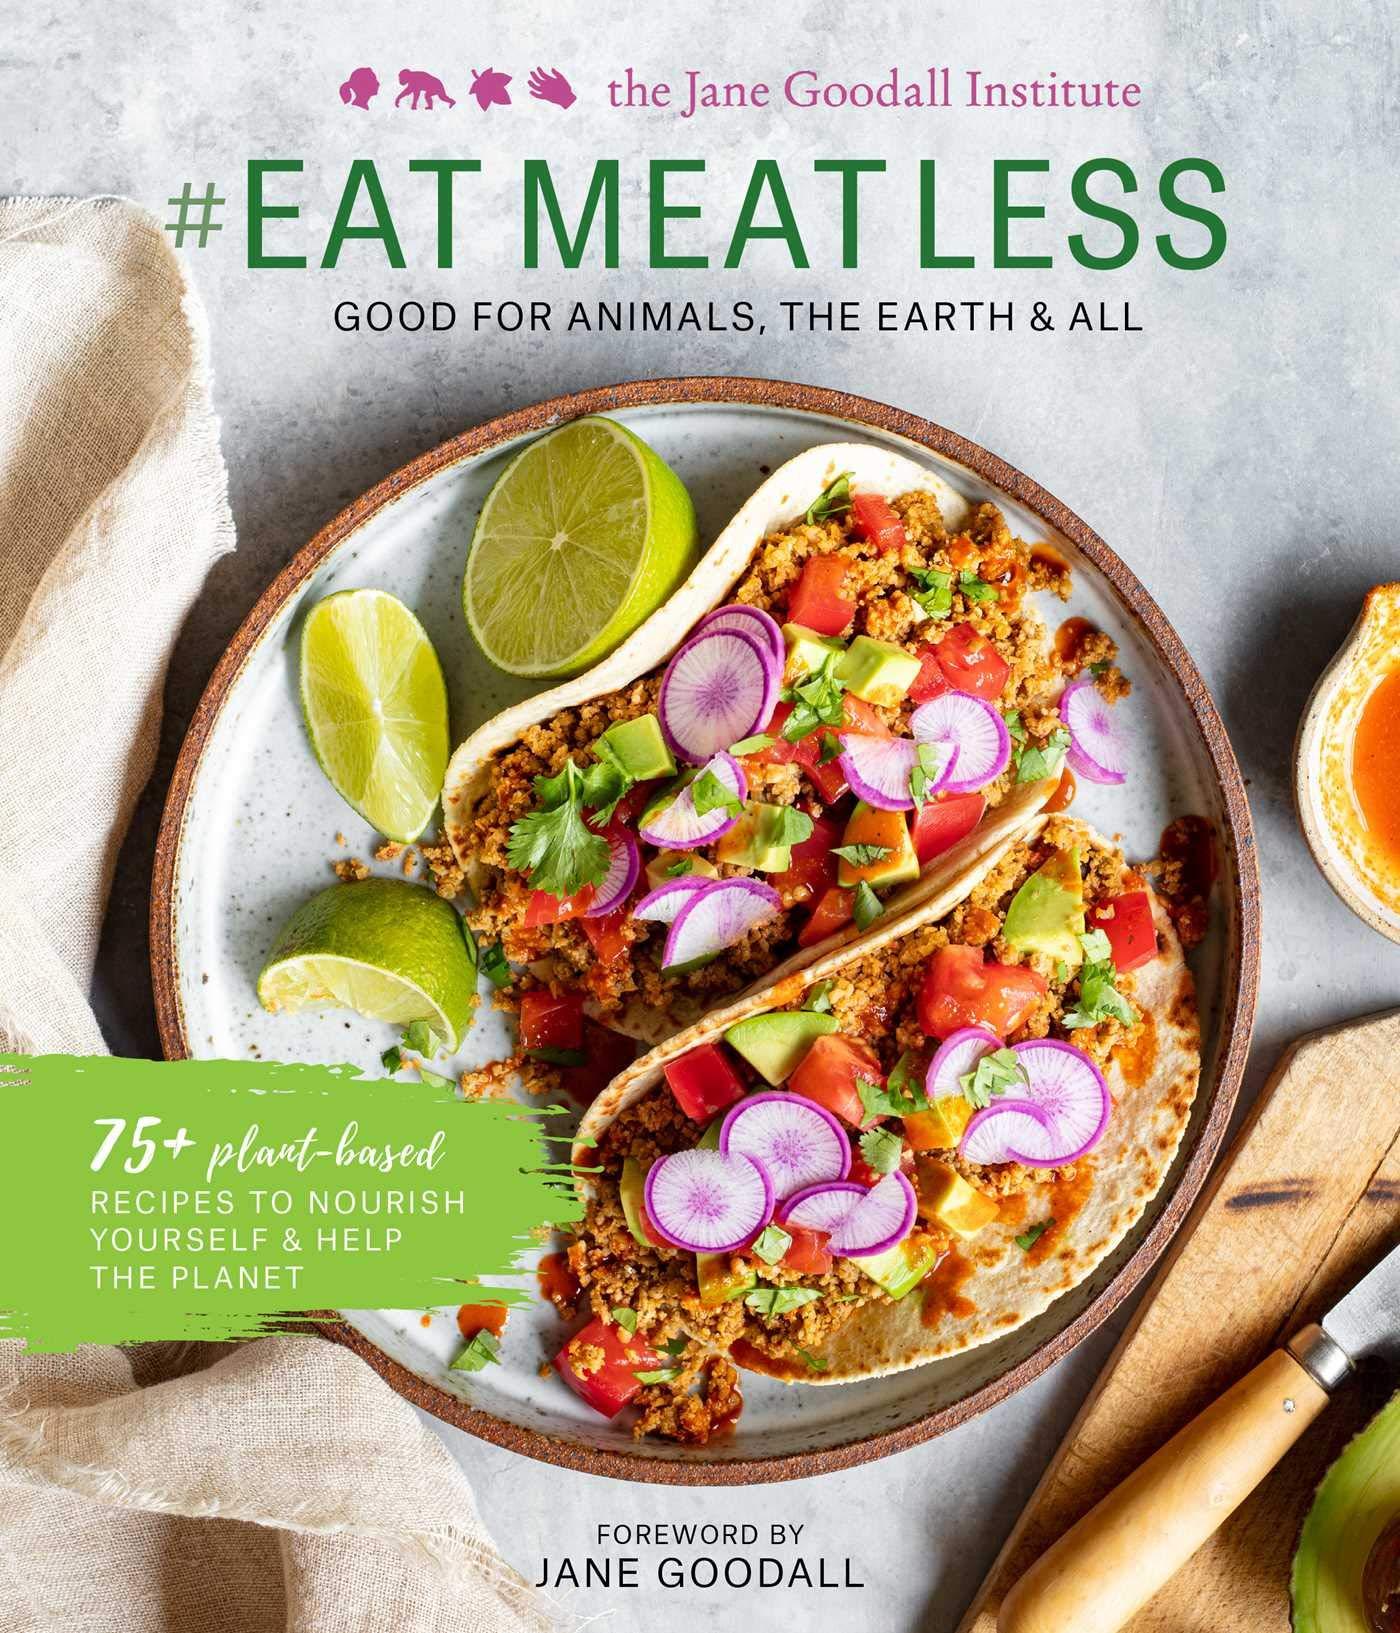 Jane Goodall Institute #EatLessMeat.